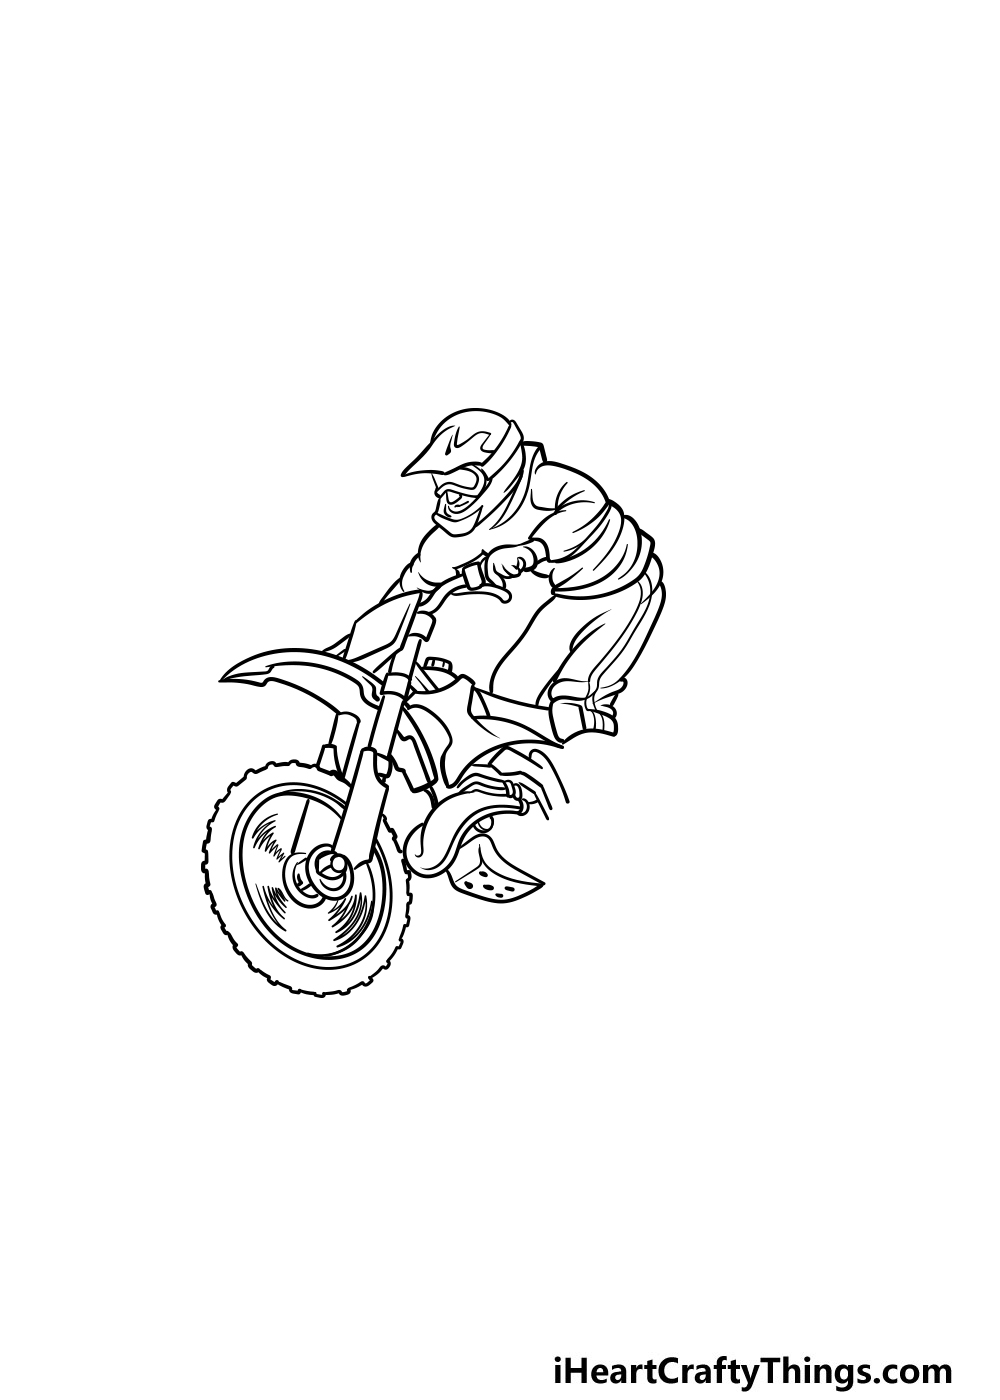 drawing a dirt bike step 3